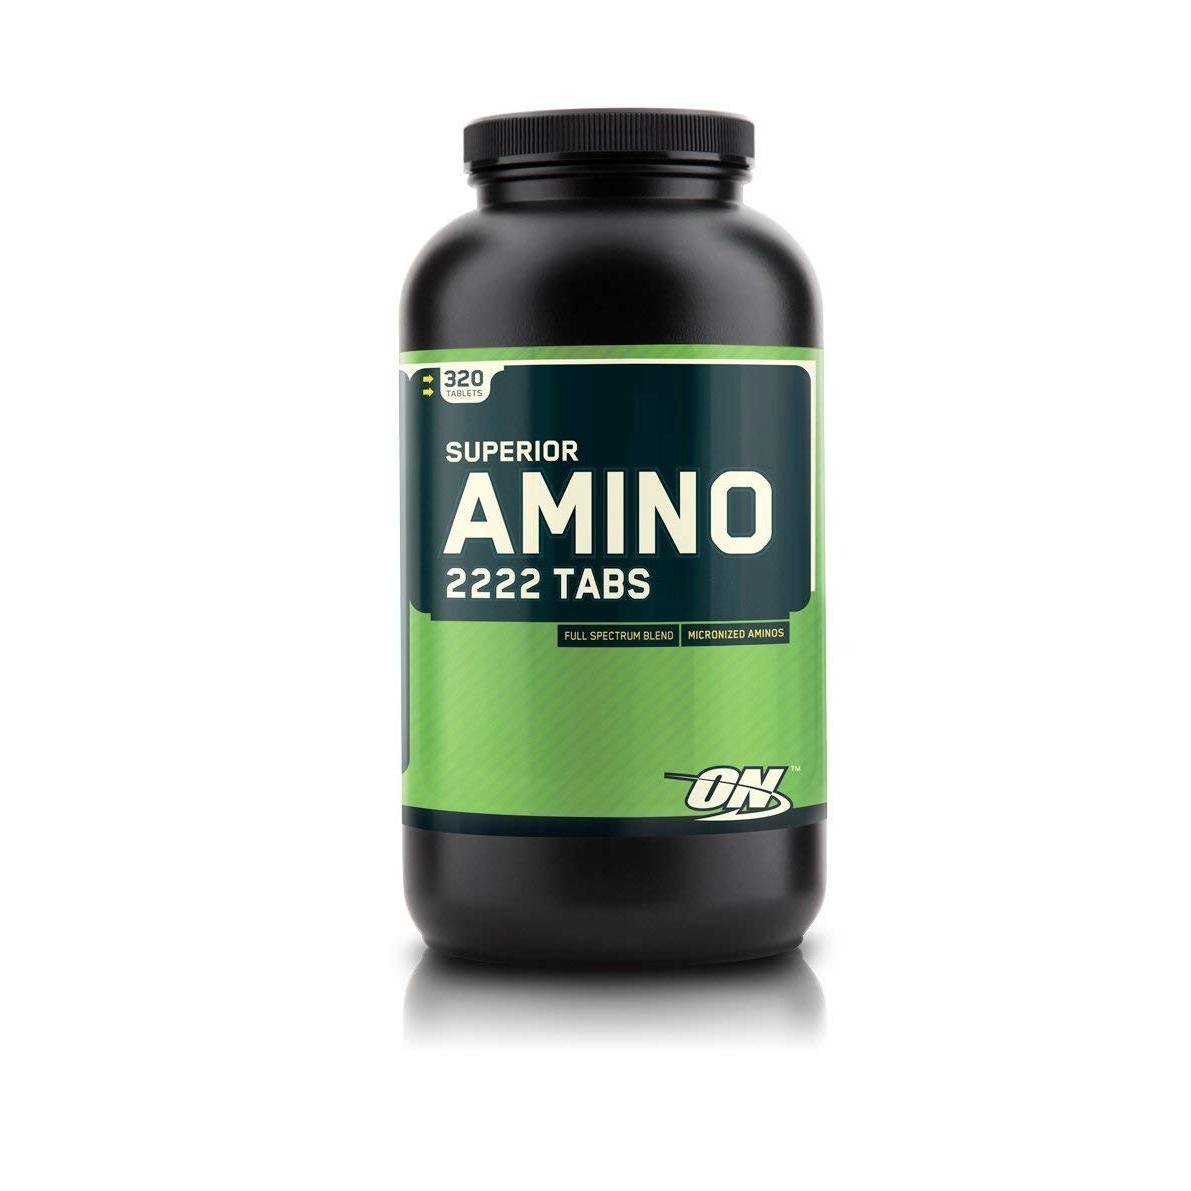 Optimum Nutrition 슈페리얼 아미노 2222 탭스 타블렛, 320개입, 1개